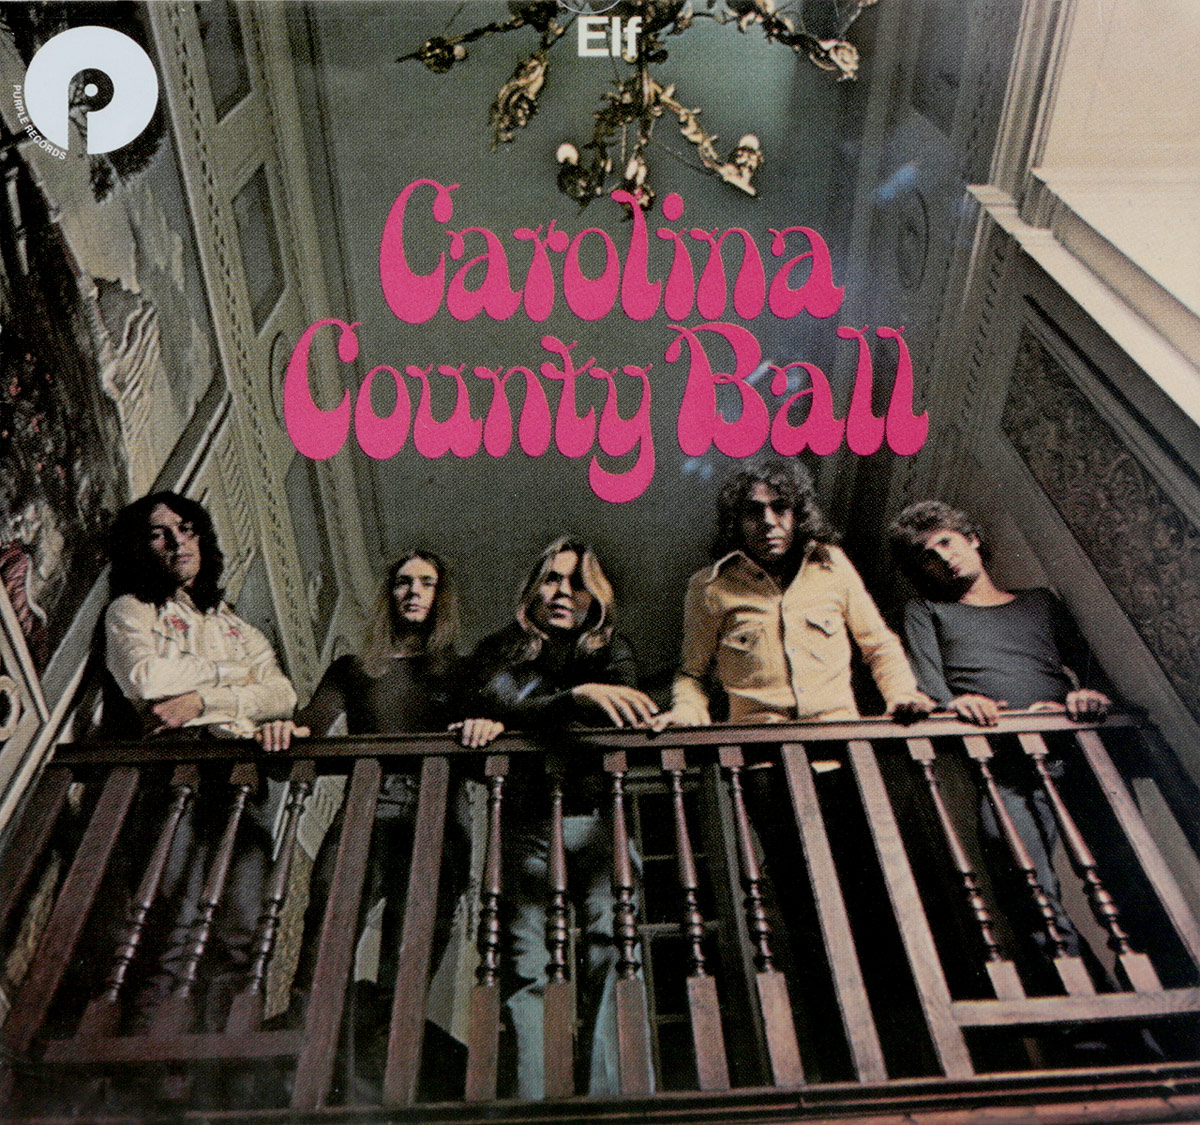 ELF,Ронни Джеймс Дио Elf. Carolina County Ball